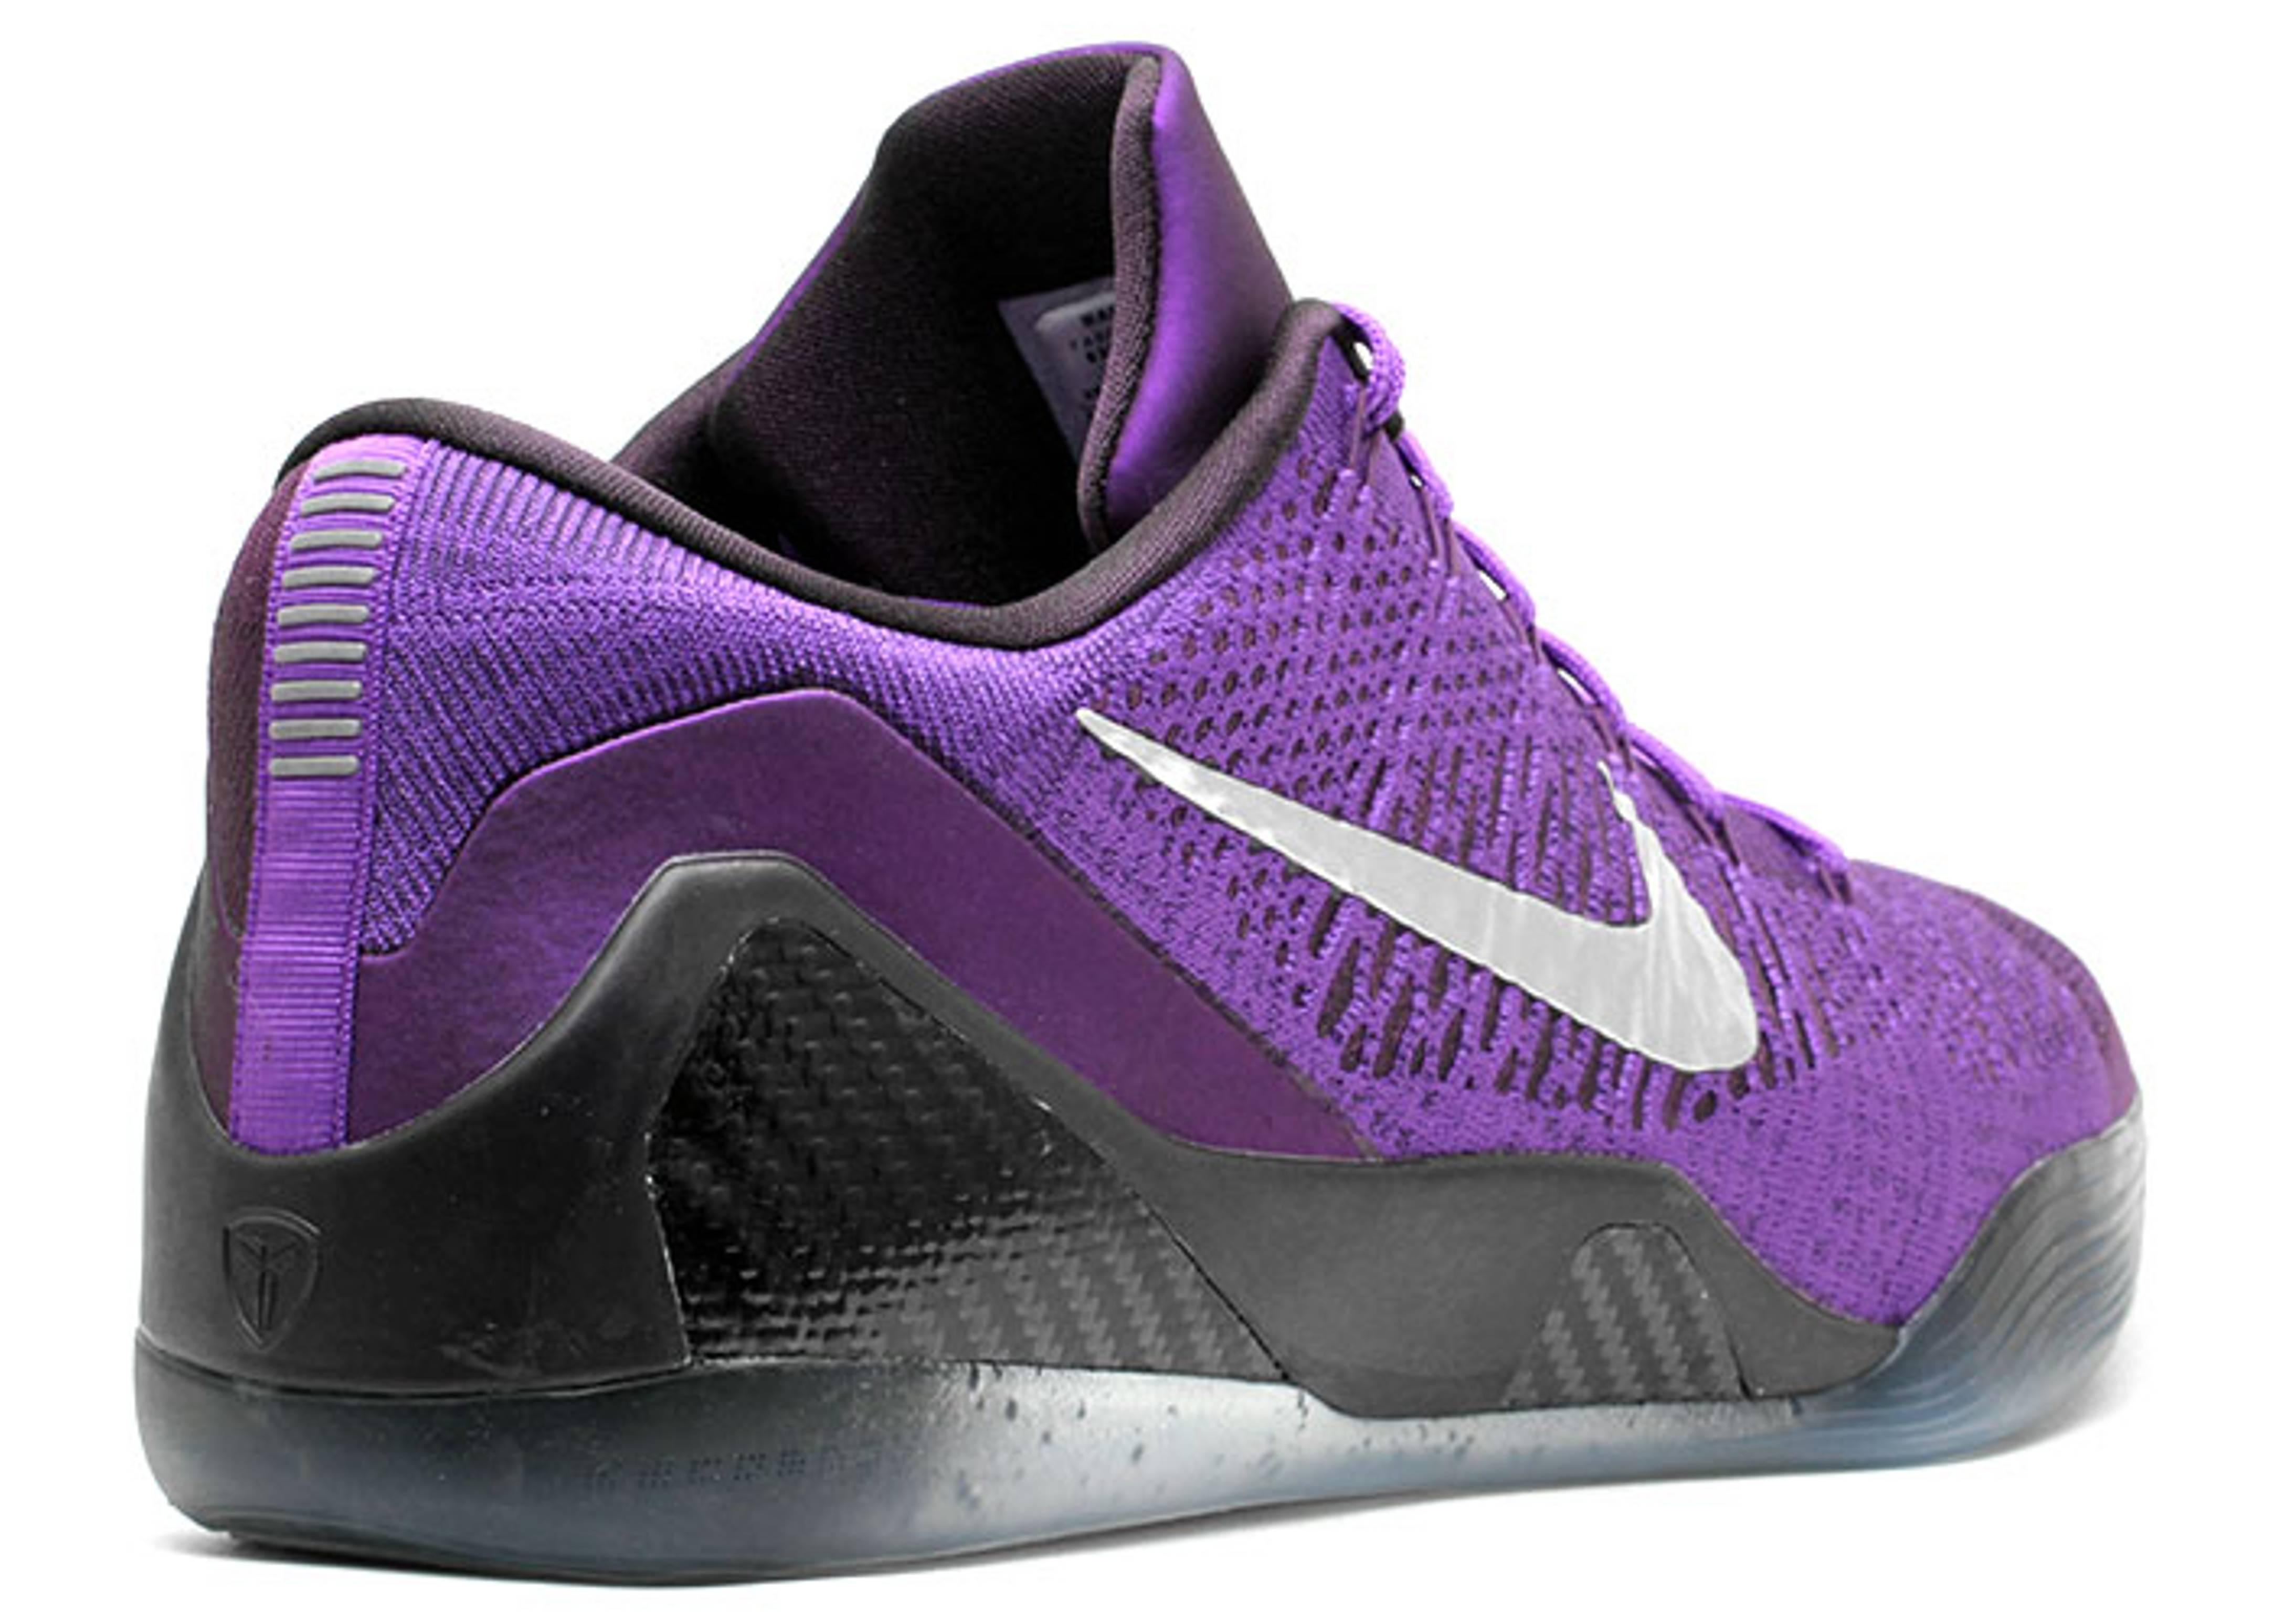 27f98c7c0 kobe 9 purple cheap   OFF57% Discounted